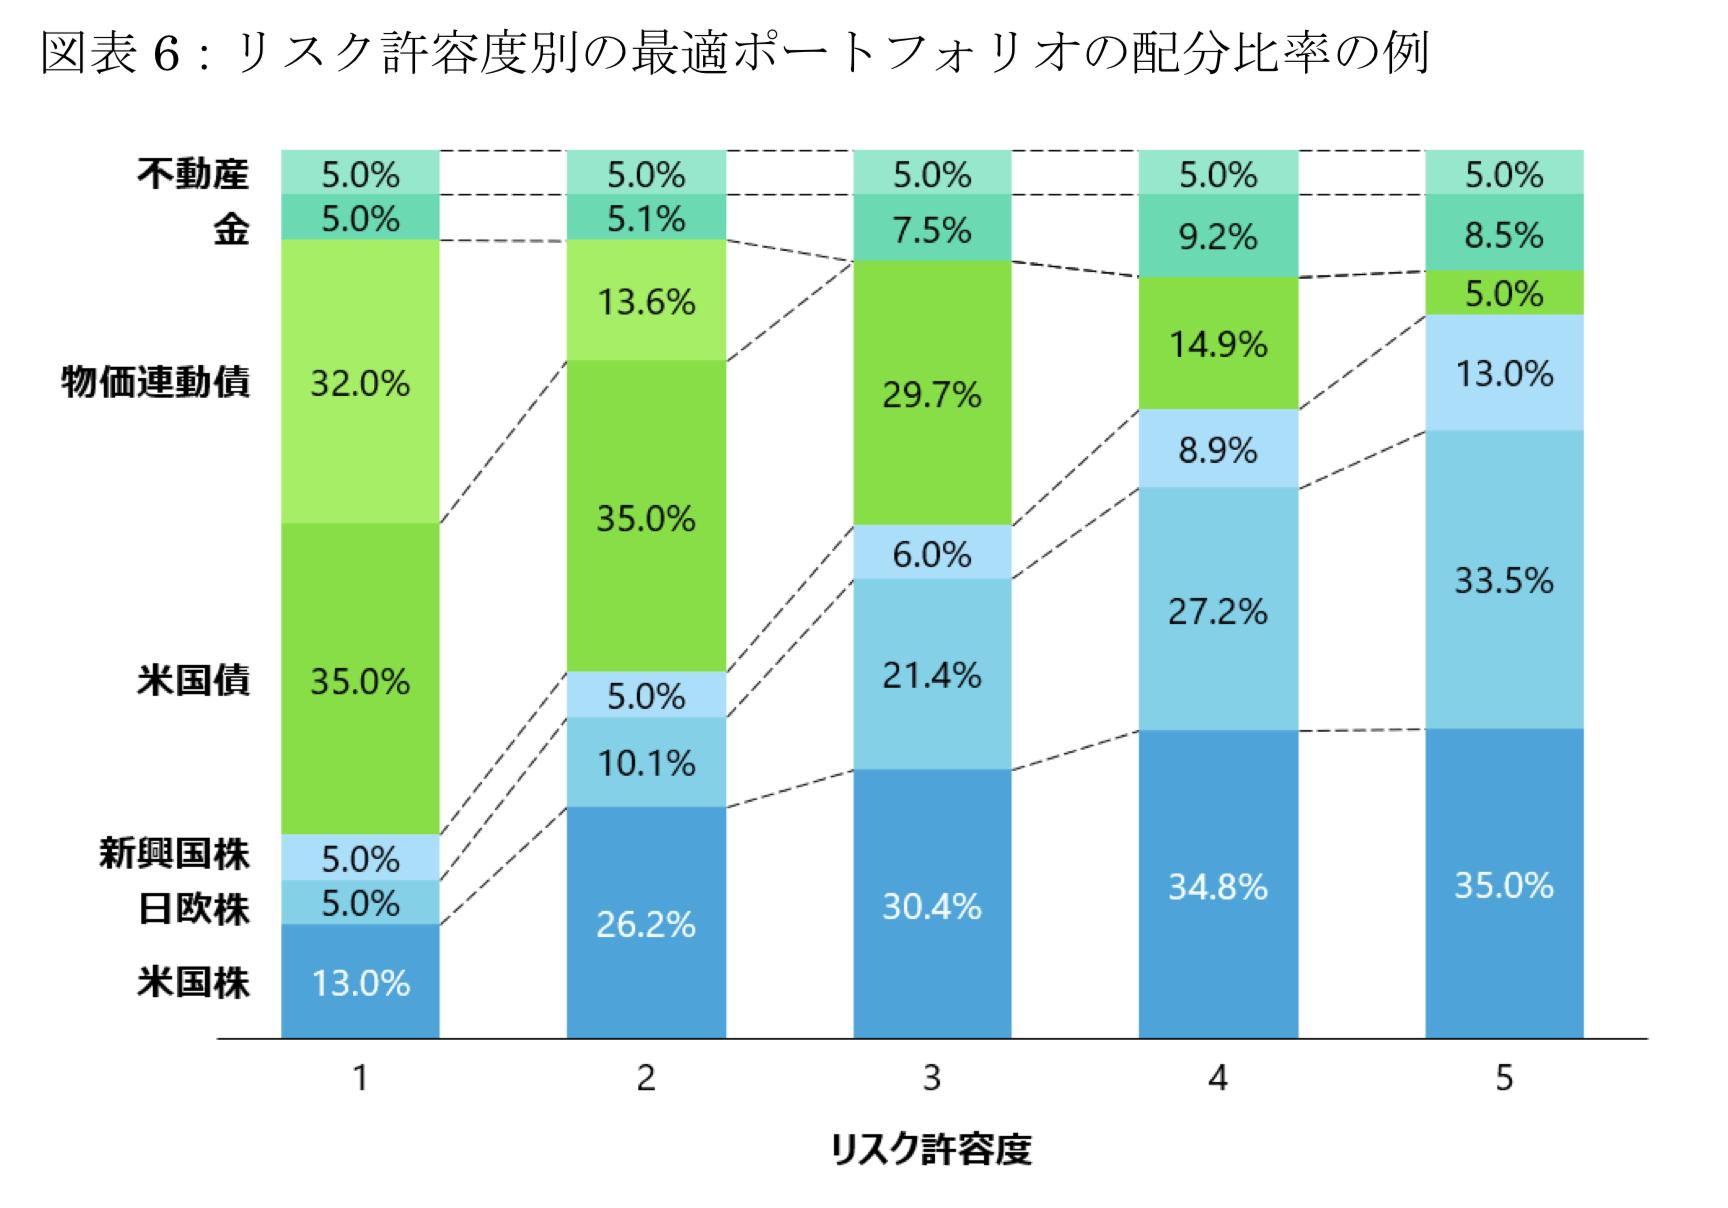 WealthNaviのリスク許容度毎のポートフォリオ構成